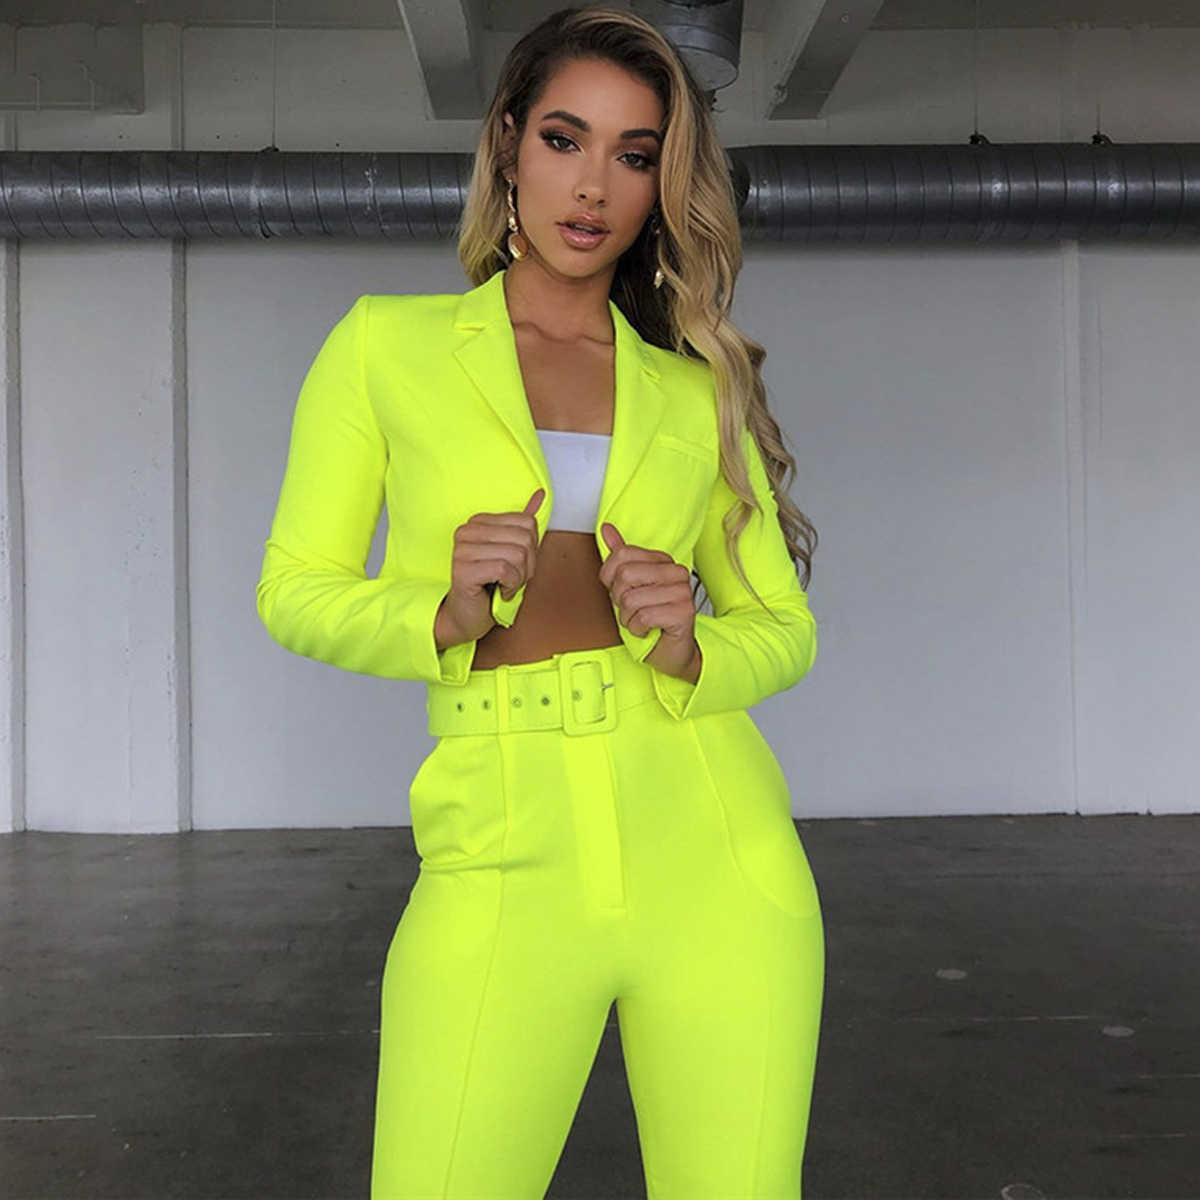 2019 mode Frauen Damen Solide Sets Langarm Revers Blazer Crop Tops OL Hosen Loungewear Mode Frauen Anzüge Trainingsanzug